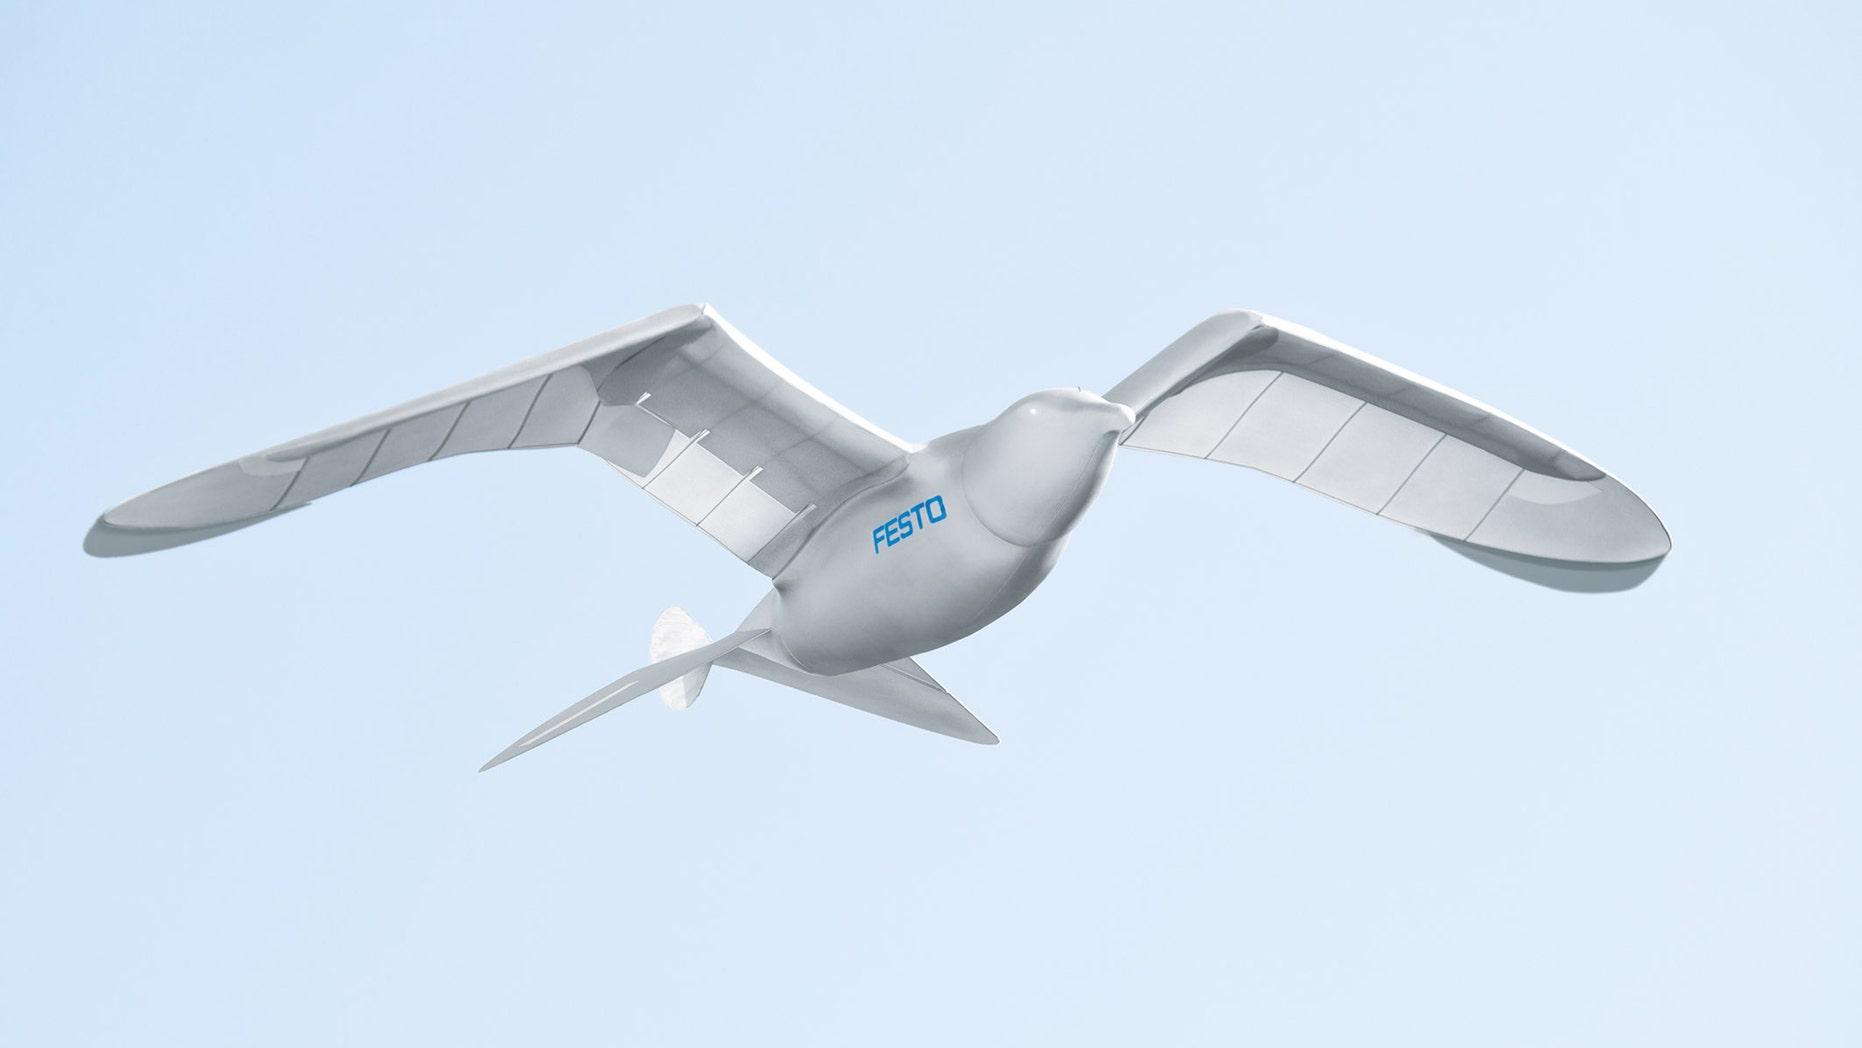 File image of a 'smartbird' (Festo)